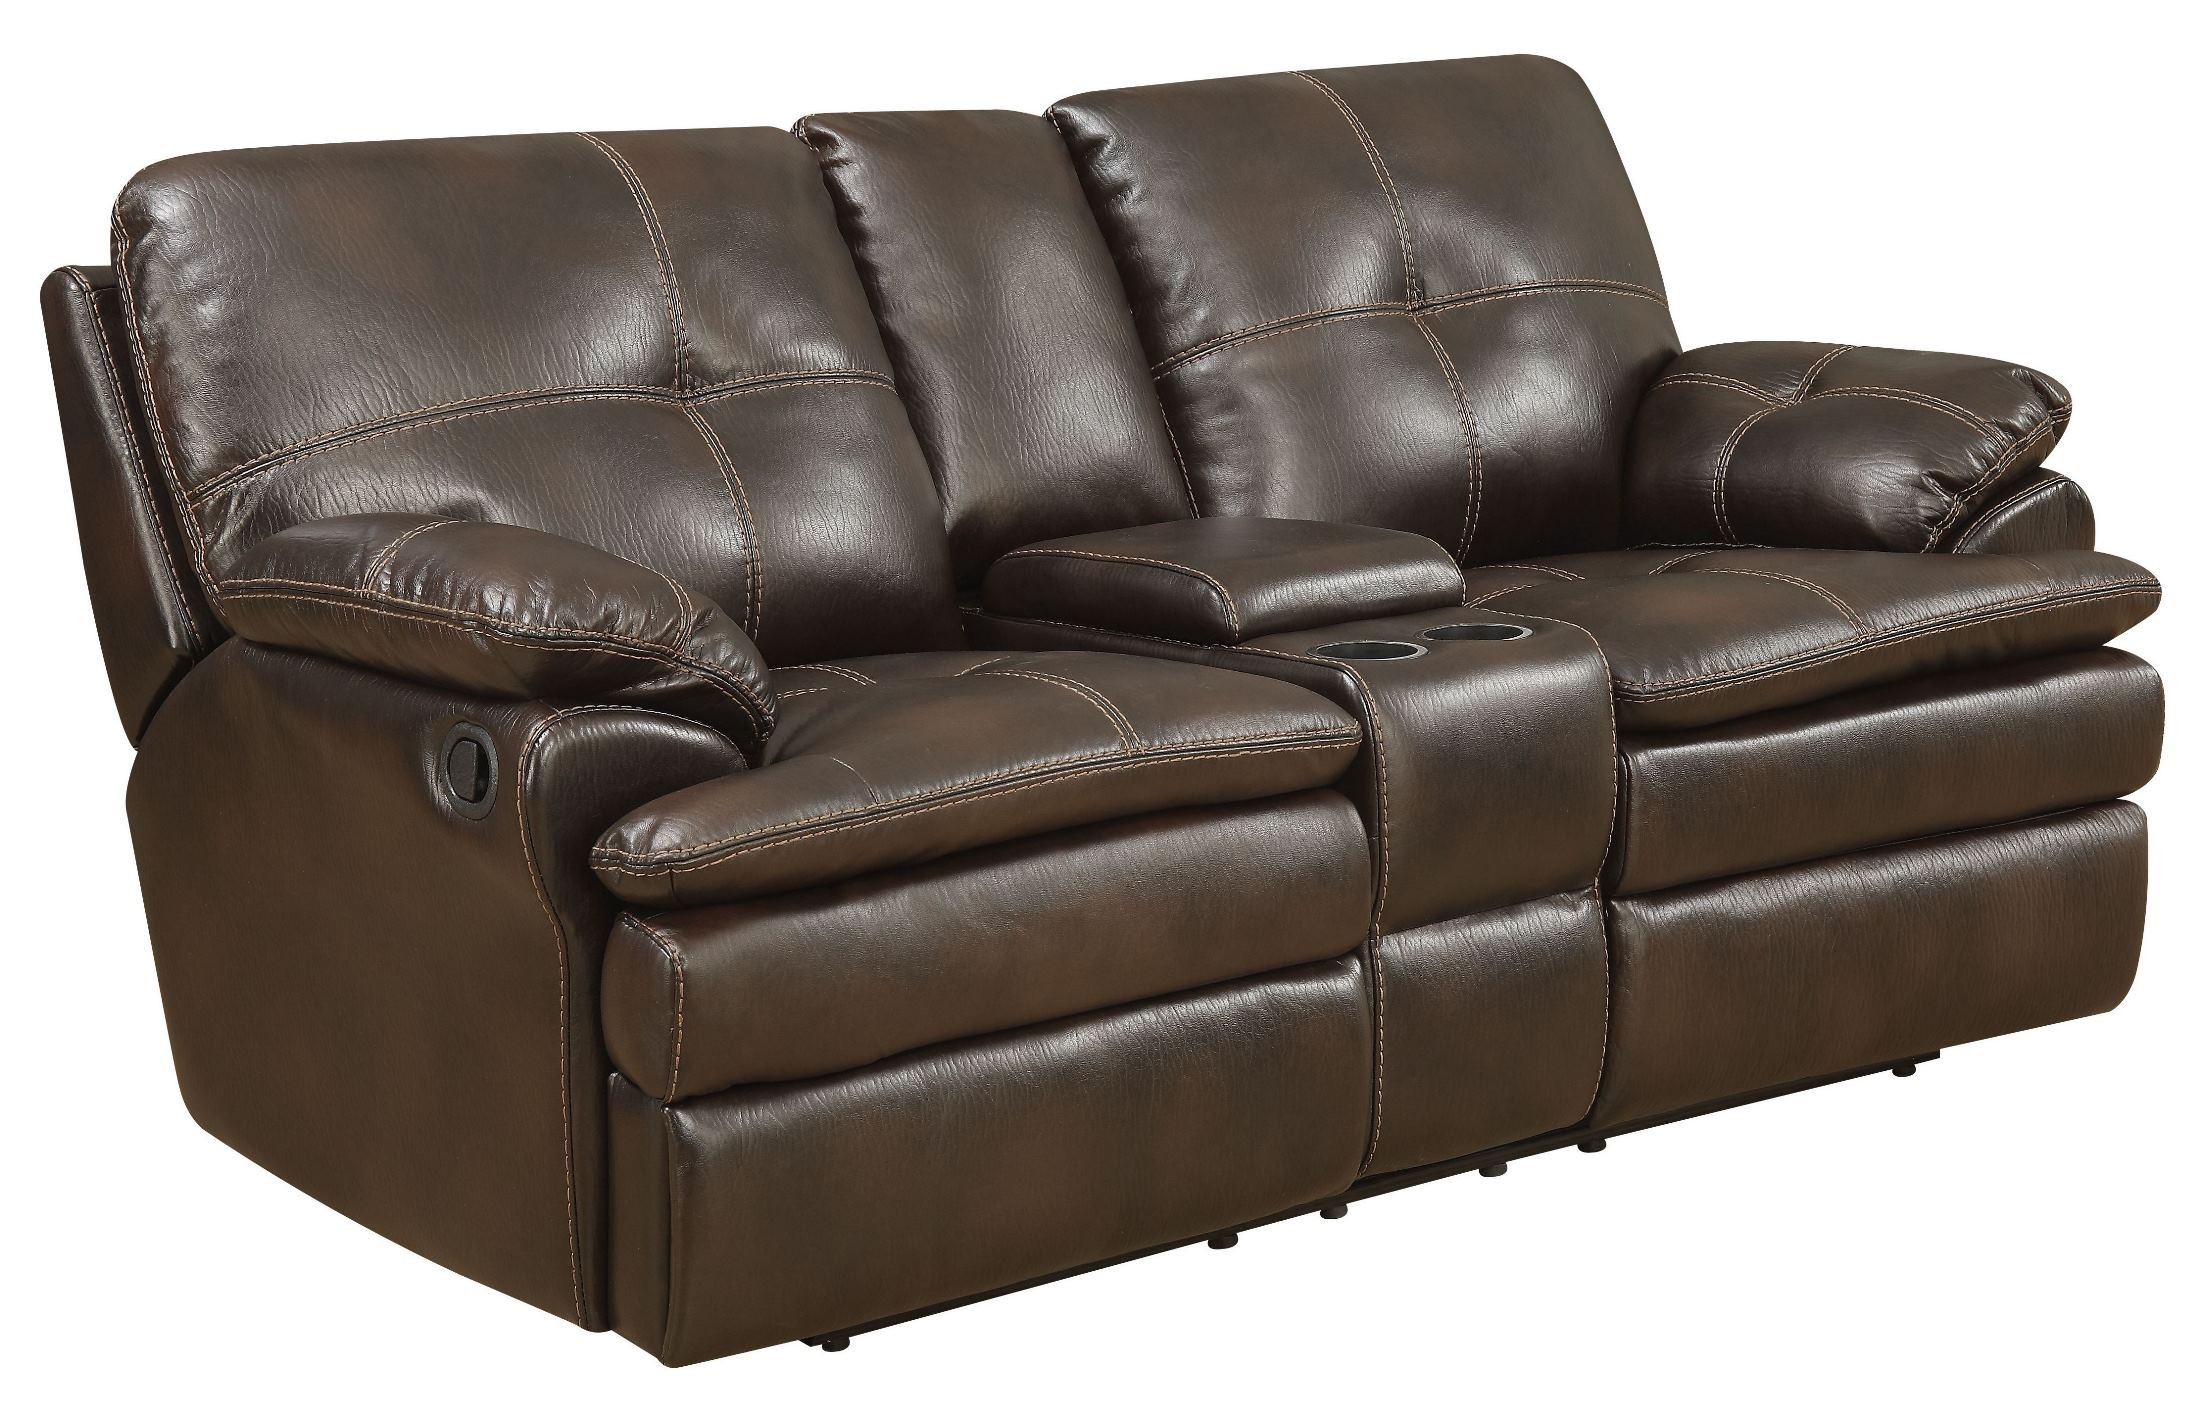 Jackson Brown Reclining Loveseat From Avalon Furniture Coleman Furniture